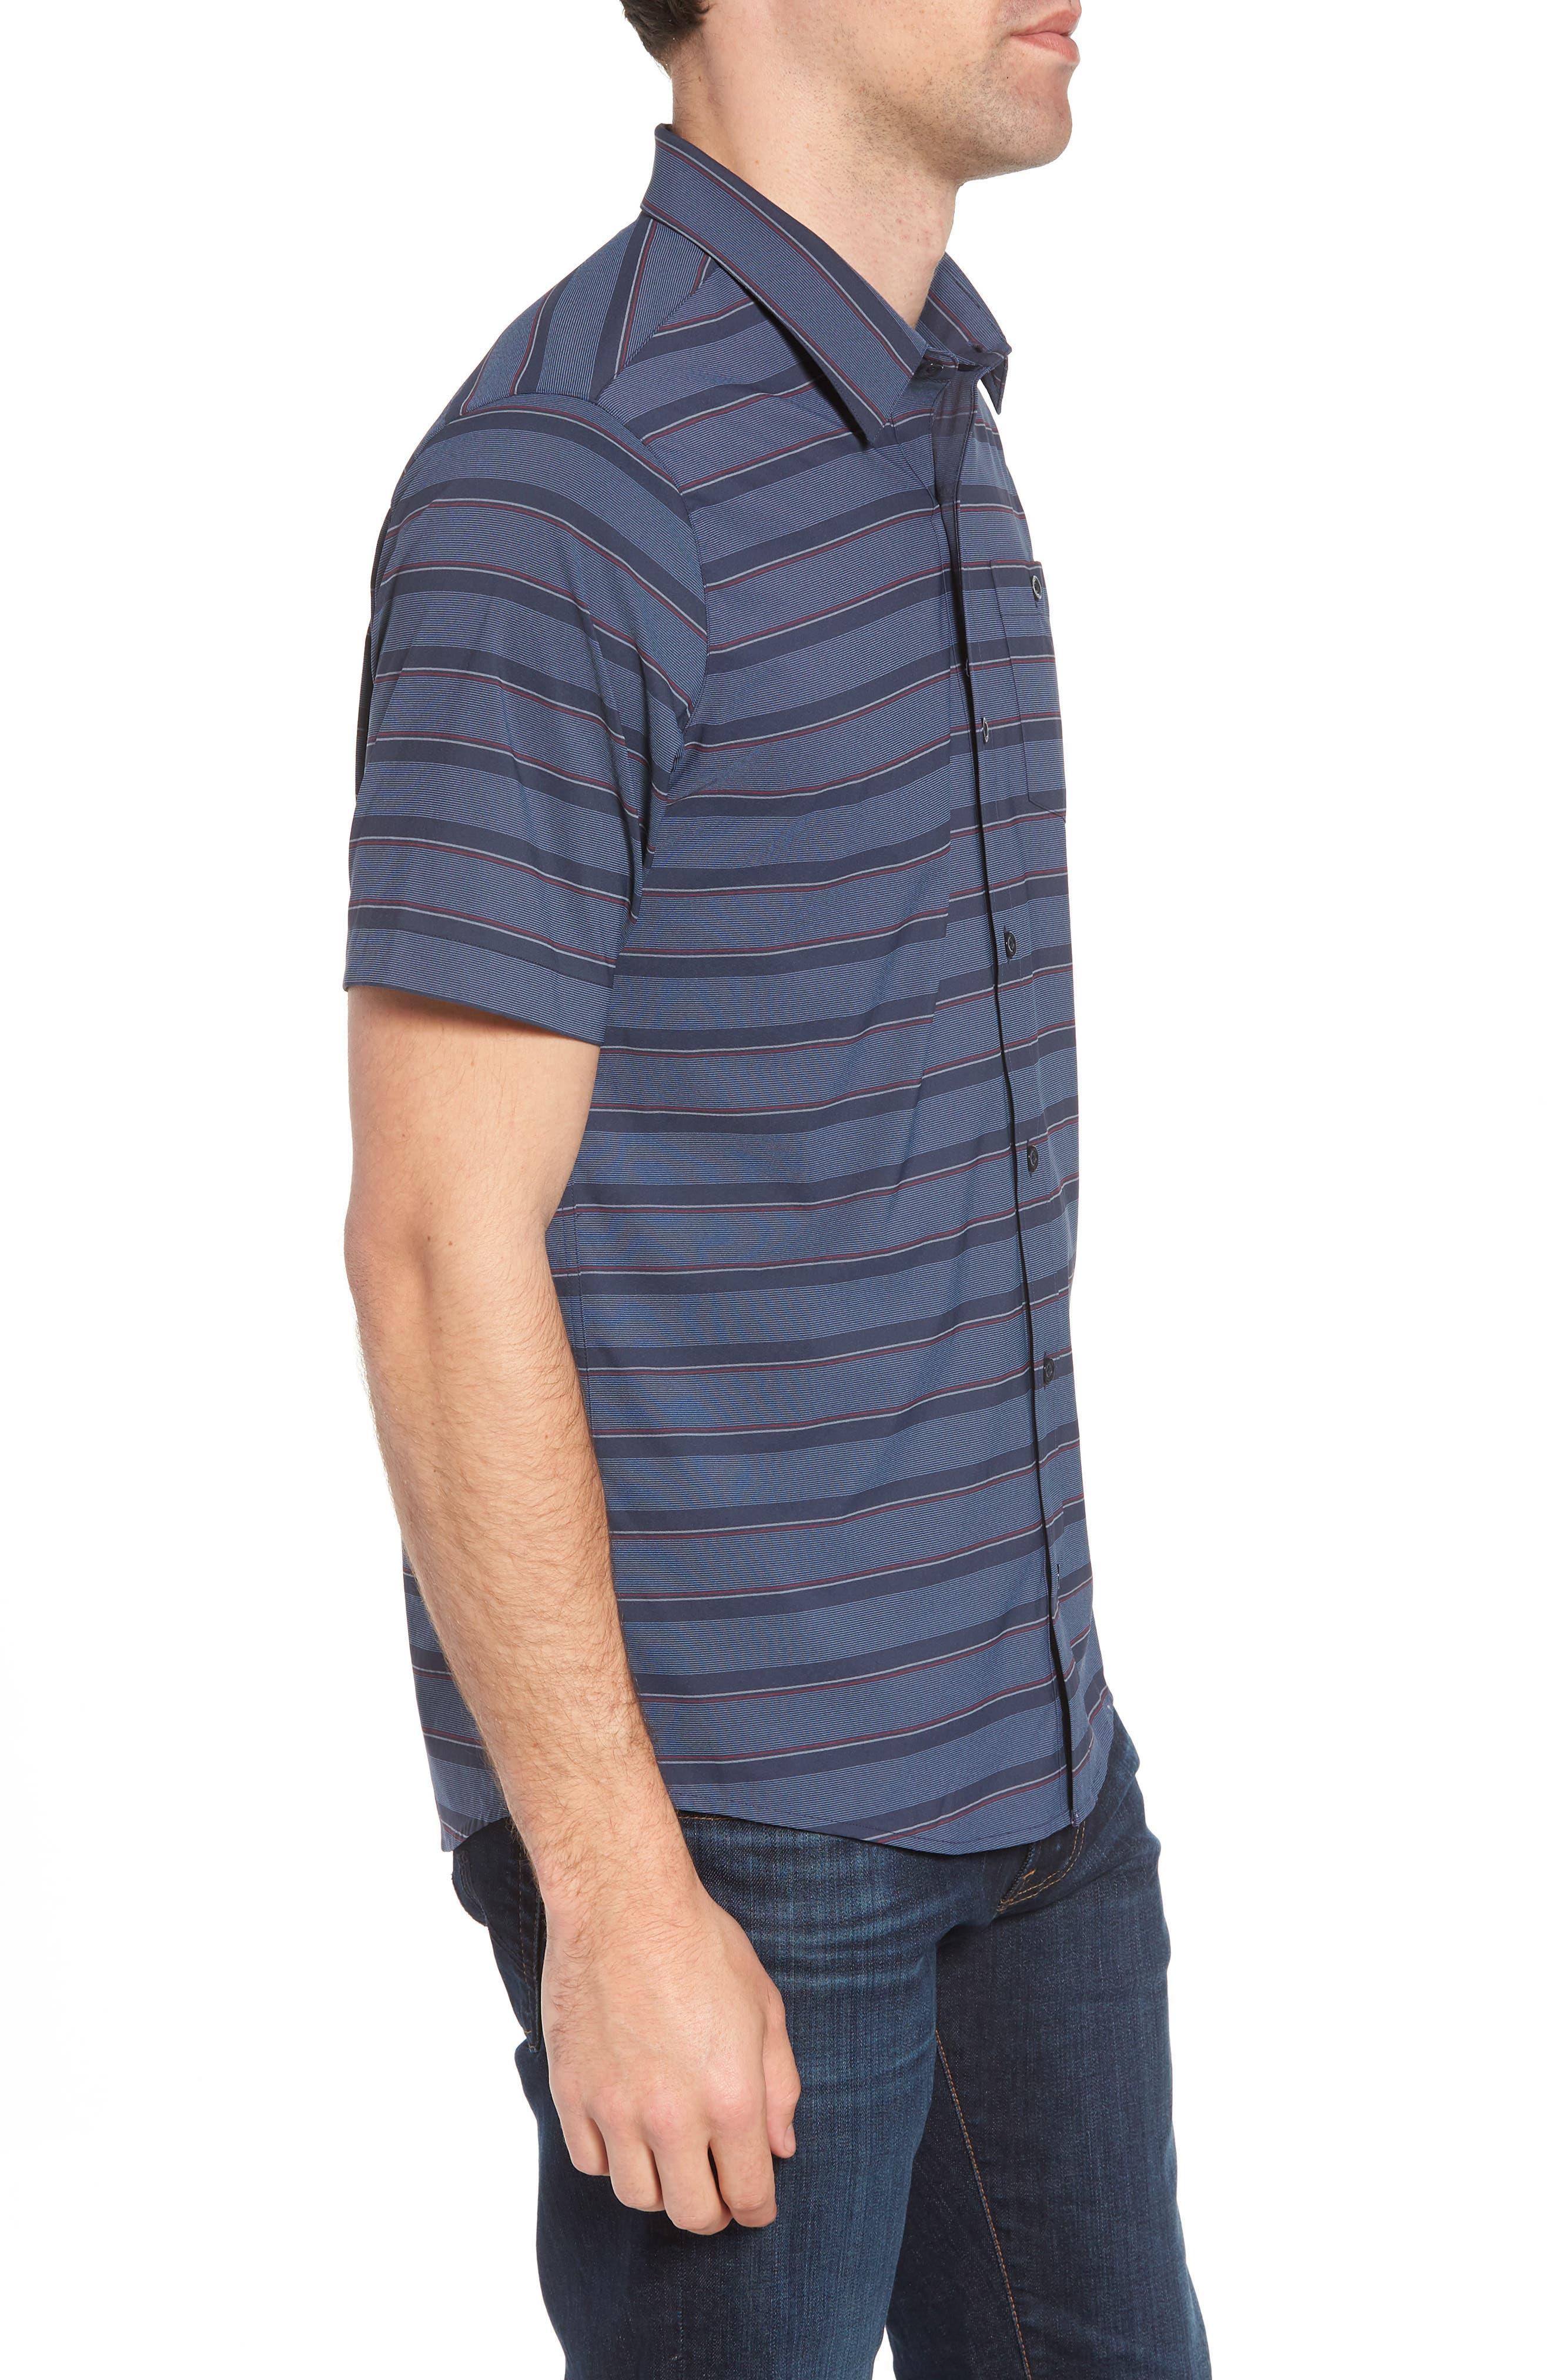 Quiver Regular Fit Sport Shirt,                             Alternate thumbnail 4, color,                             Blue Nights